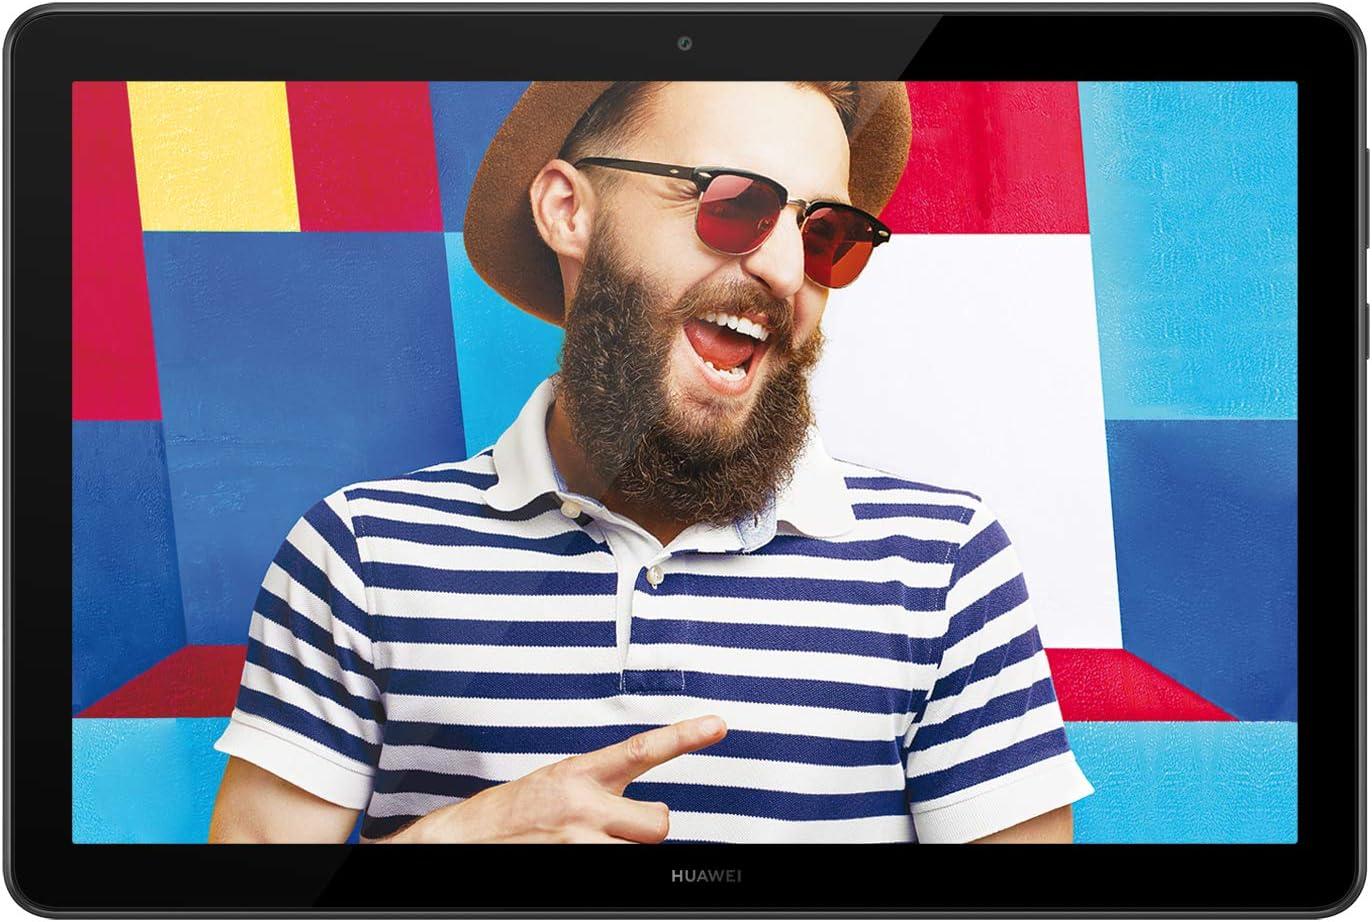 HUAWEI Sale SALE% OFF Mediapad T5 10.1 inch Lit Latest item O System Tablet 2GB+32GB GMS PC